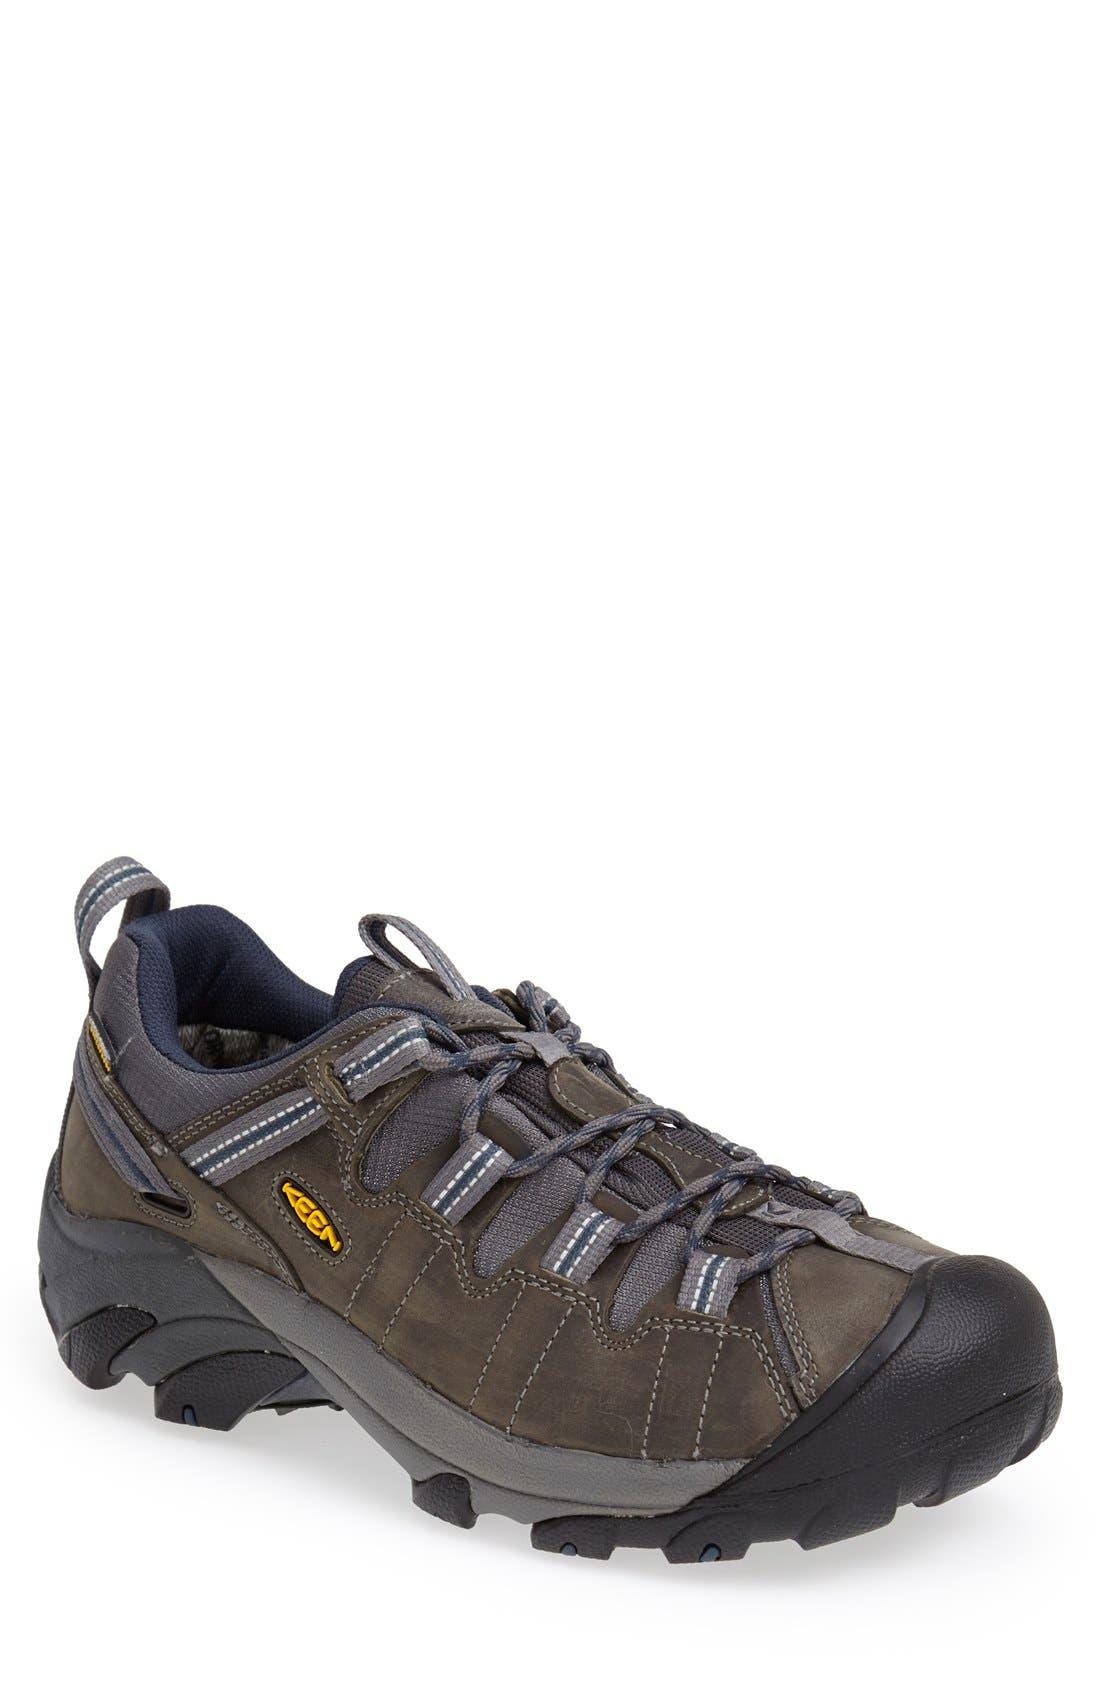 KEEN 'Targhee II' Waterproof Hiking Shoe, Main, color, GARGOLYE/ MIDNGHT NAVY